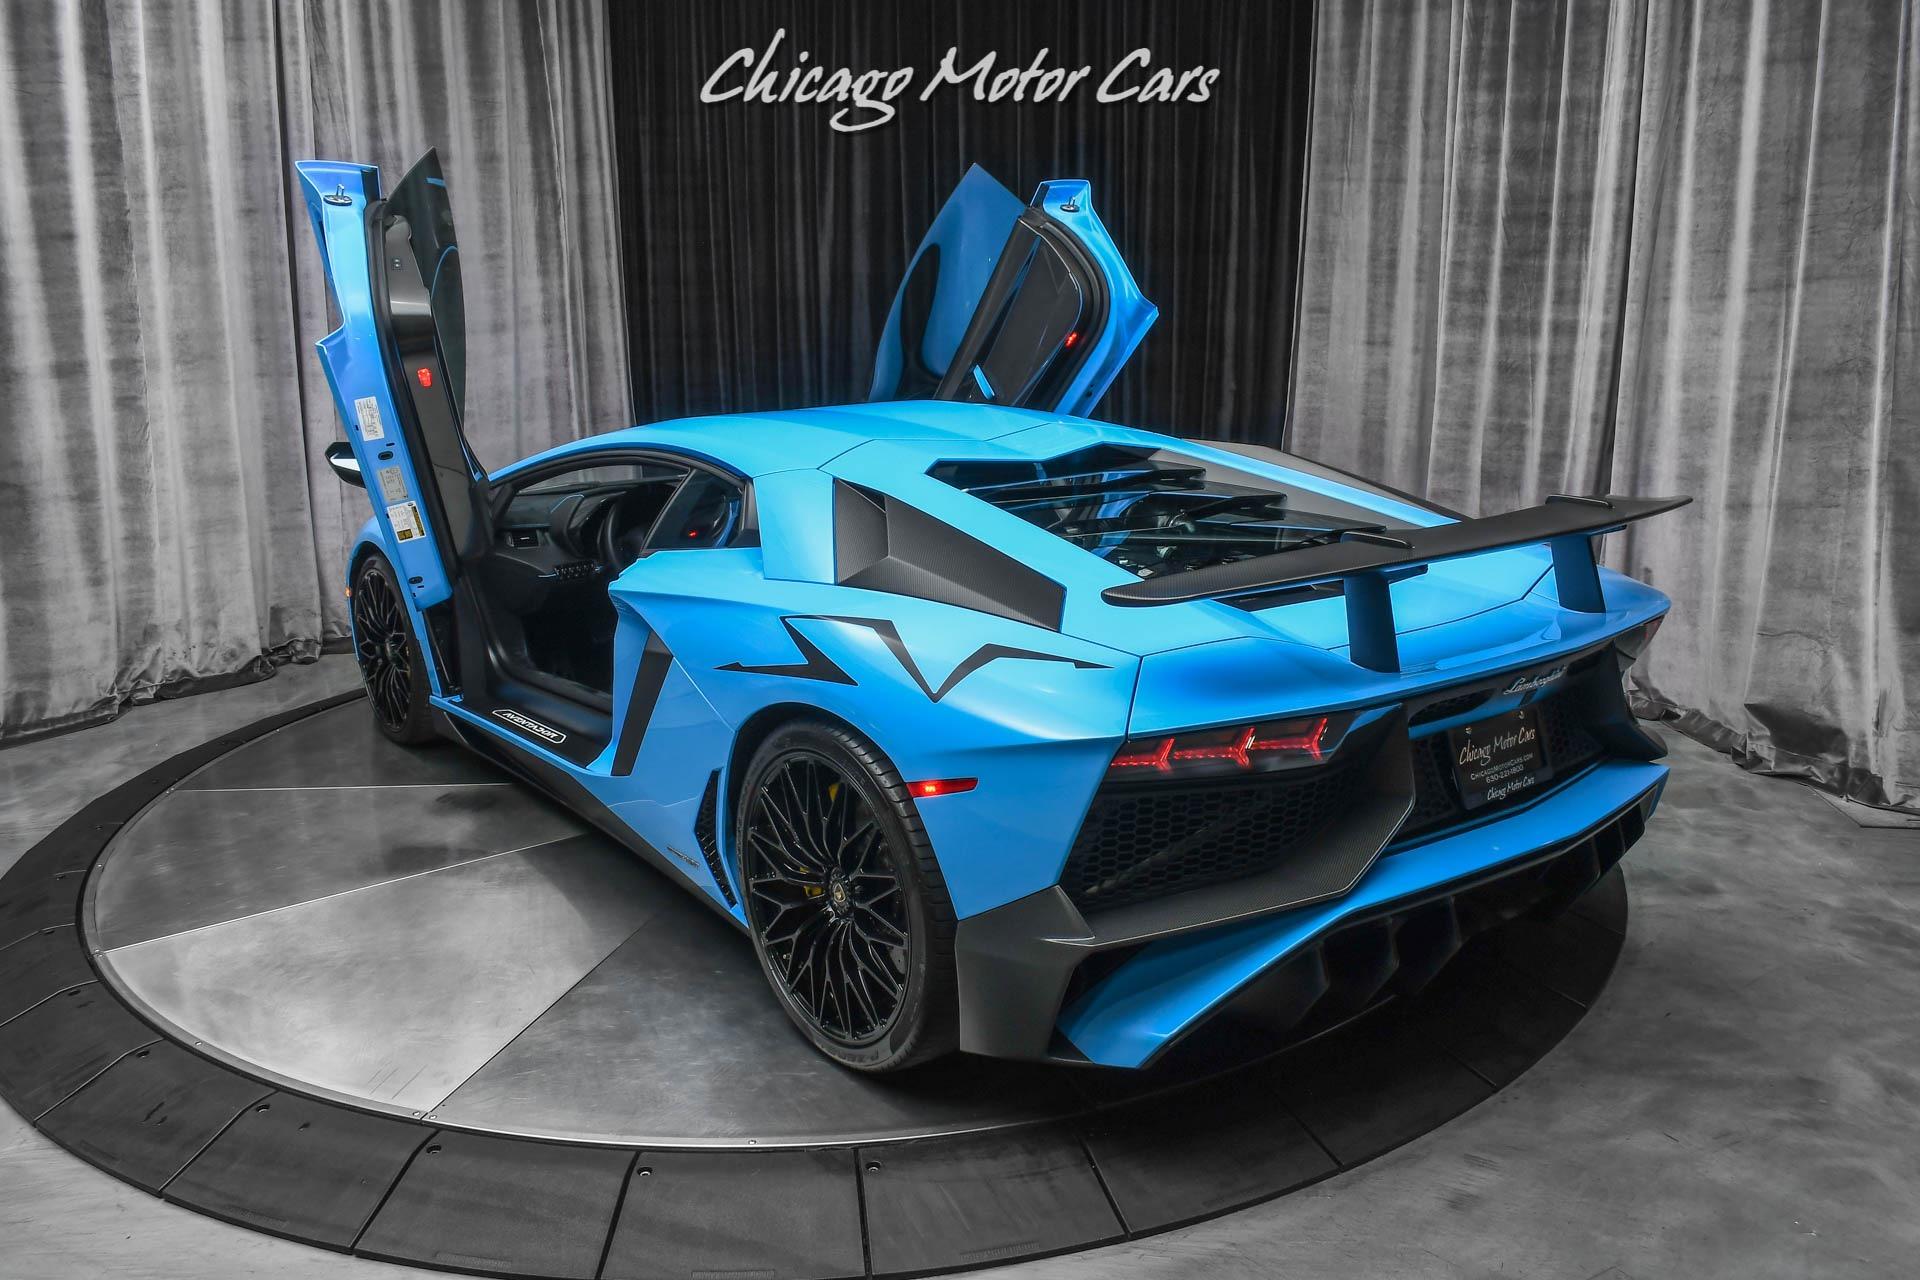 Used-2017-Lamborghini-Aventador-SV-LP750-4-Coupe-RARE-Blue-Cepheus-Carbon-Fiber-Only-5K-Miles